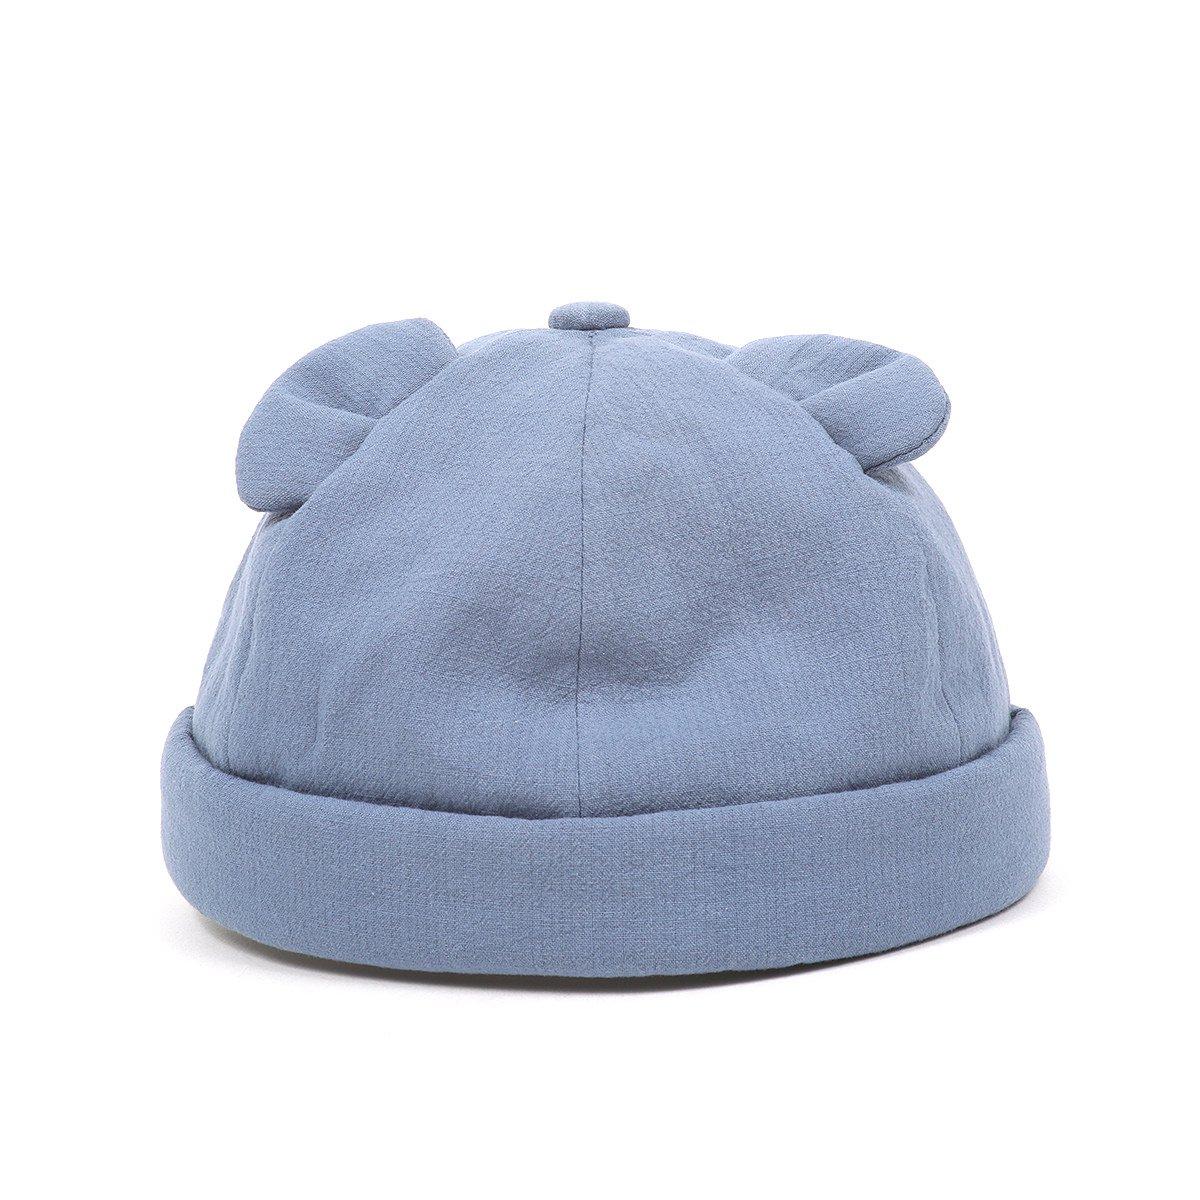 【BABY】Baby Linen Bear Cap 詳細画像3